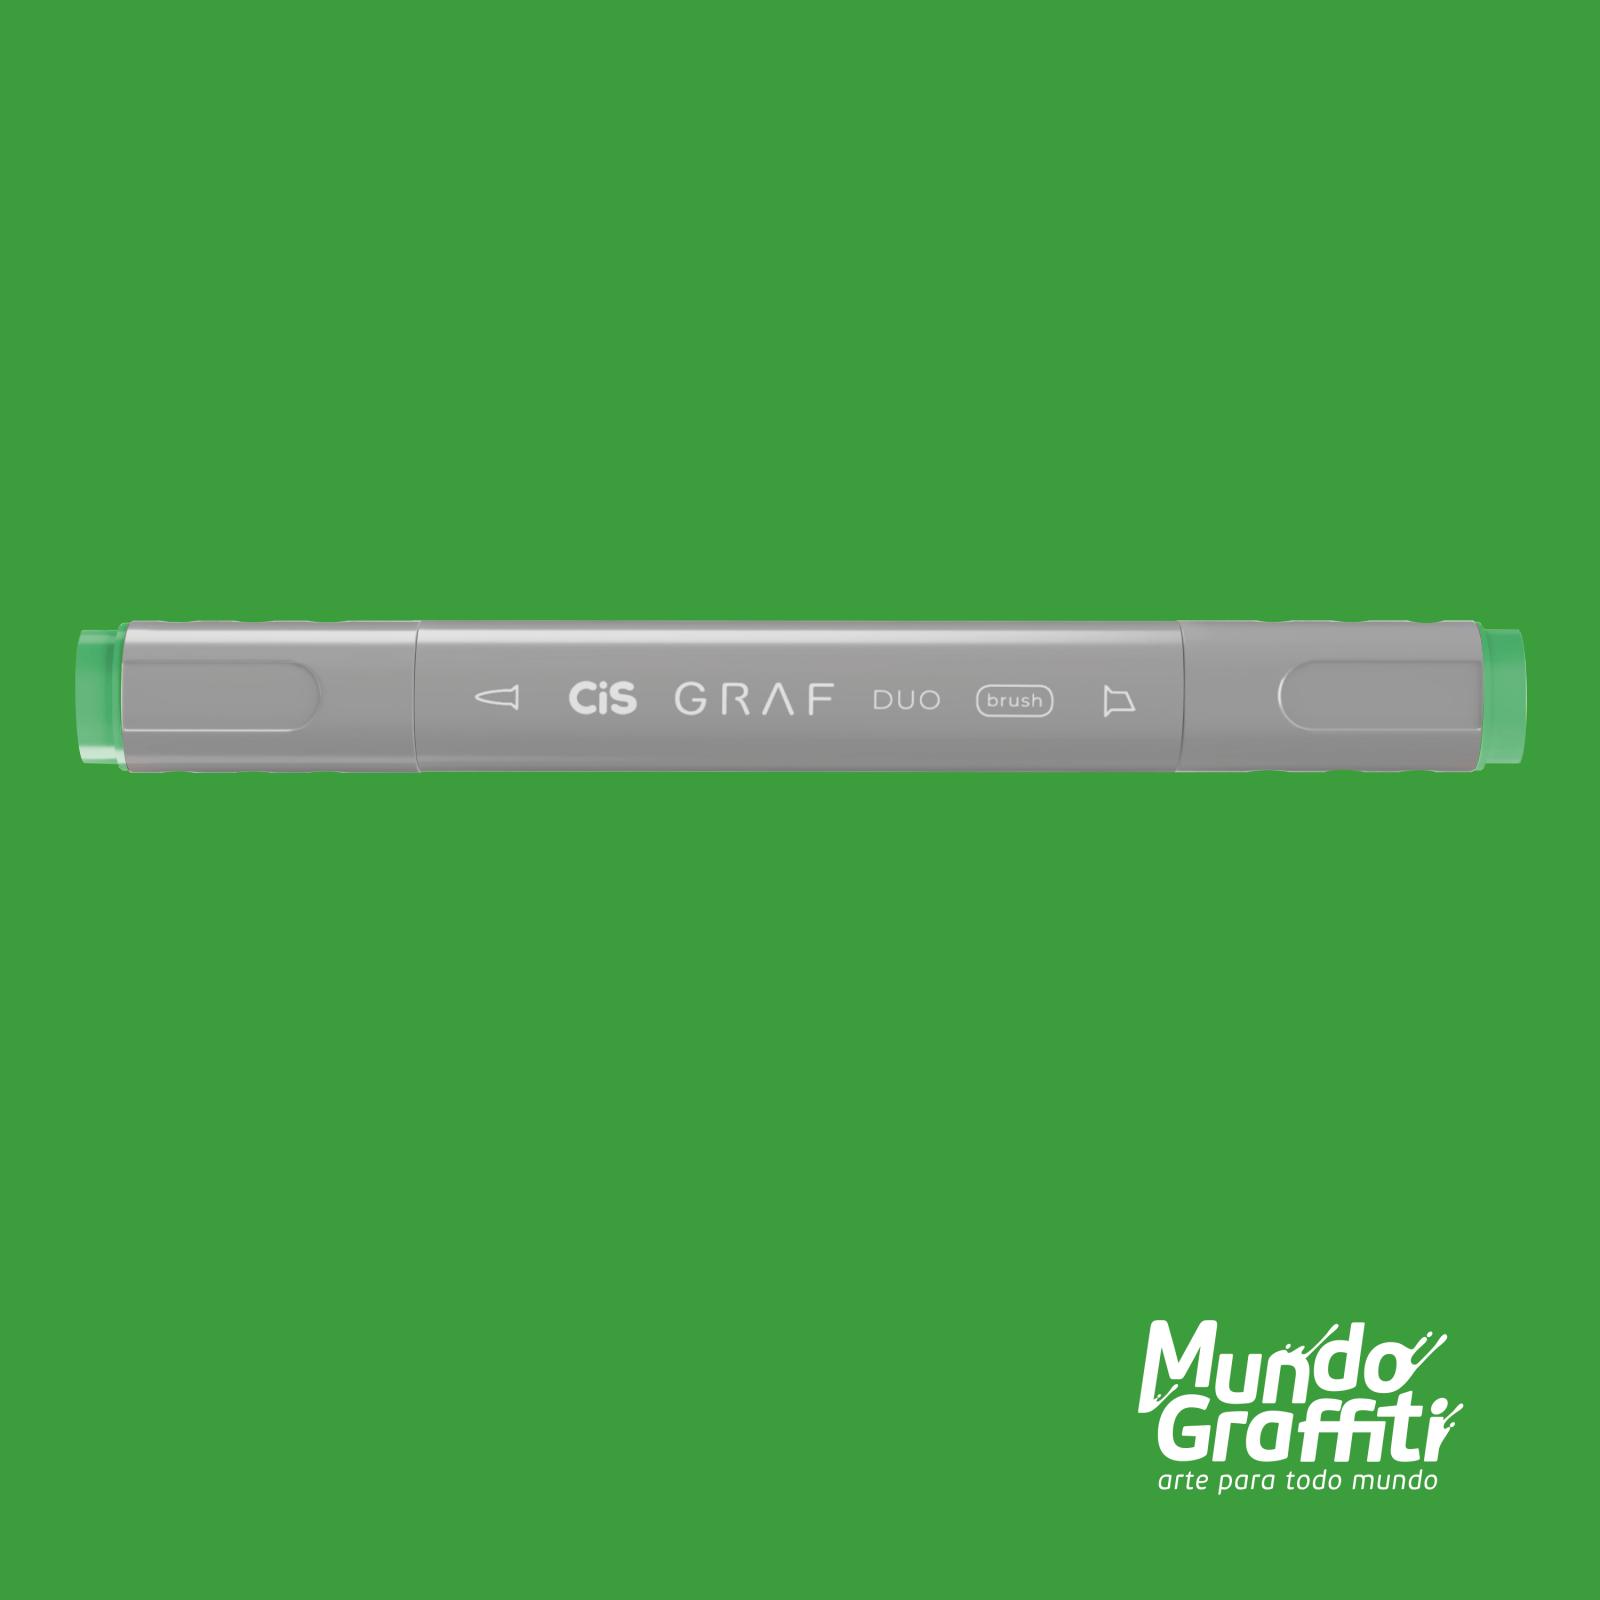 Marcador Cis Graf Duo Brush Vivid Green 46 - Mundo Graffiti